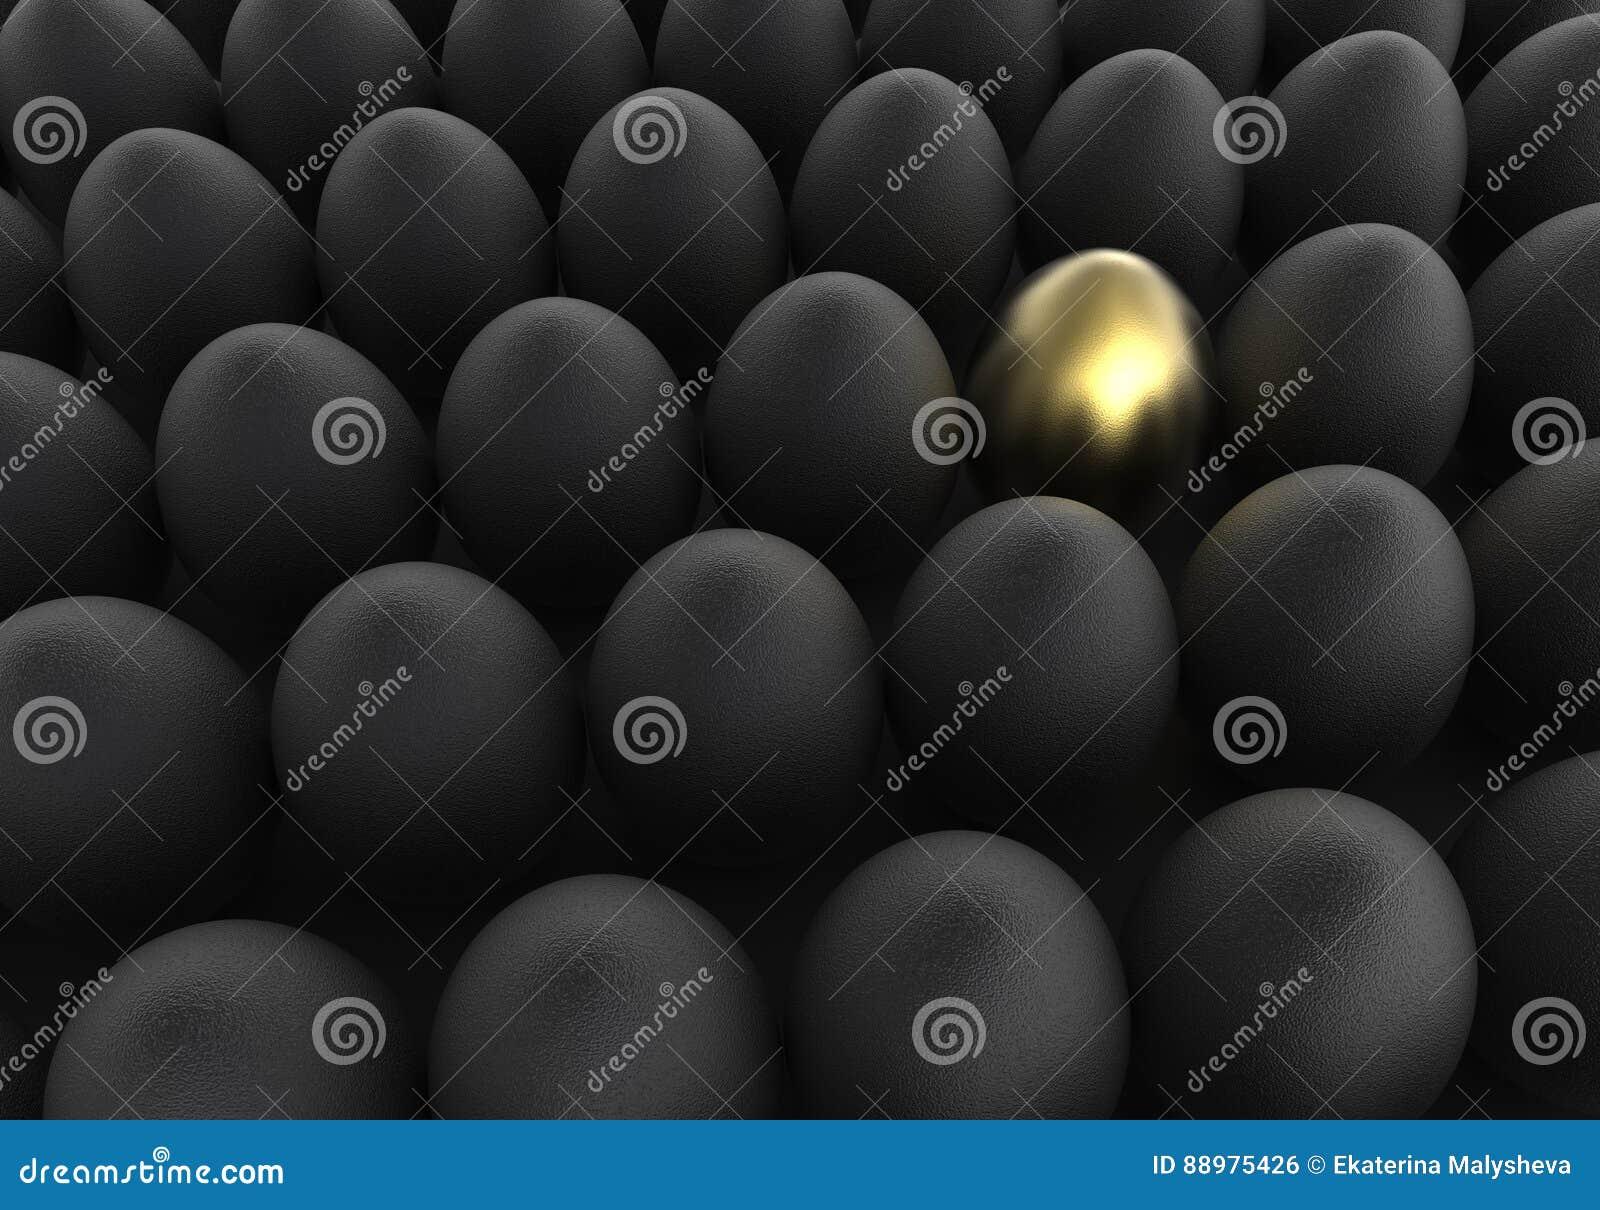 Ovos dourados e pretos do fundo da Páscoa